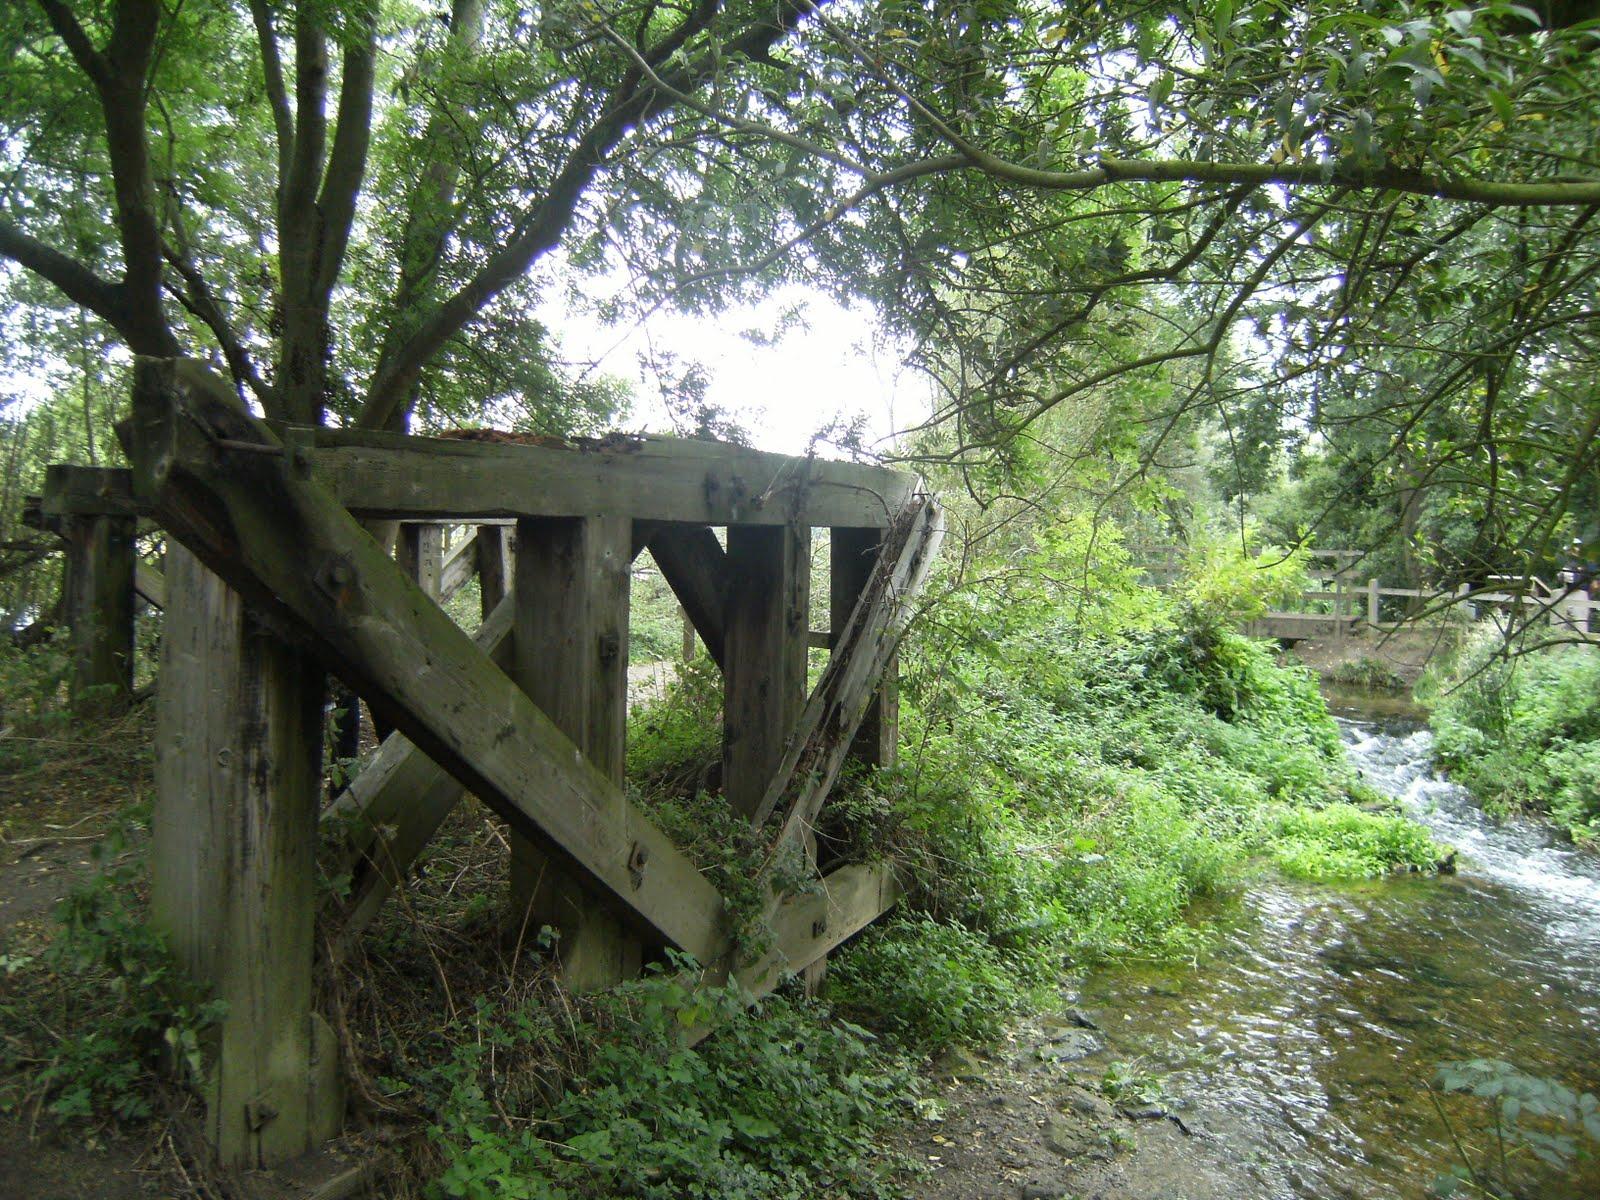 DSCF9453 Remains of old railway bridge